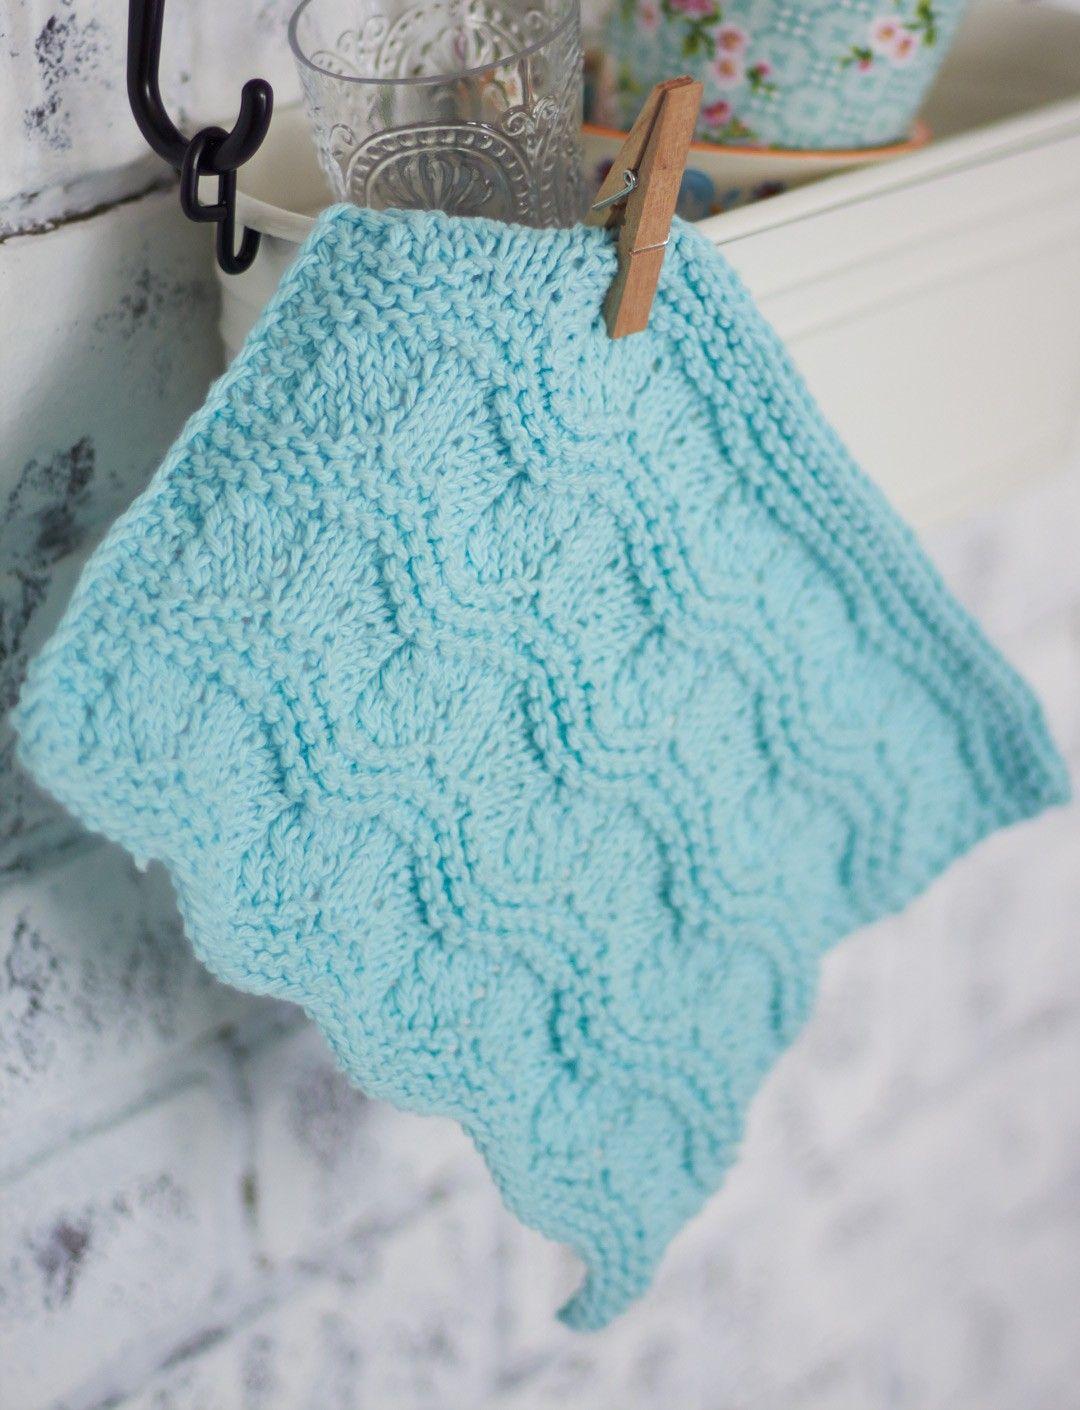 Free knitting pattern for Ripple Stitch Dishcloth - http://www ...